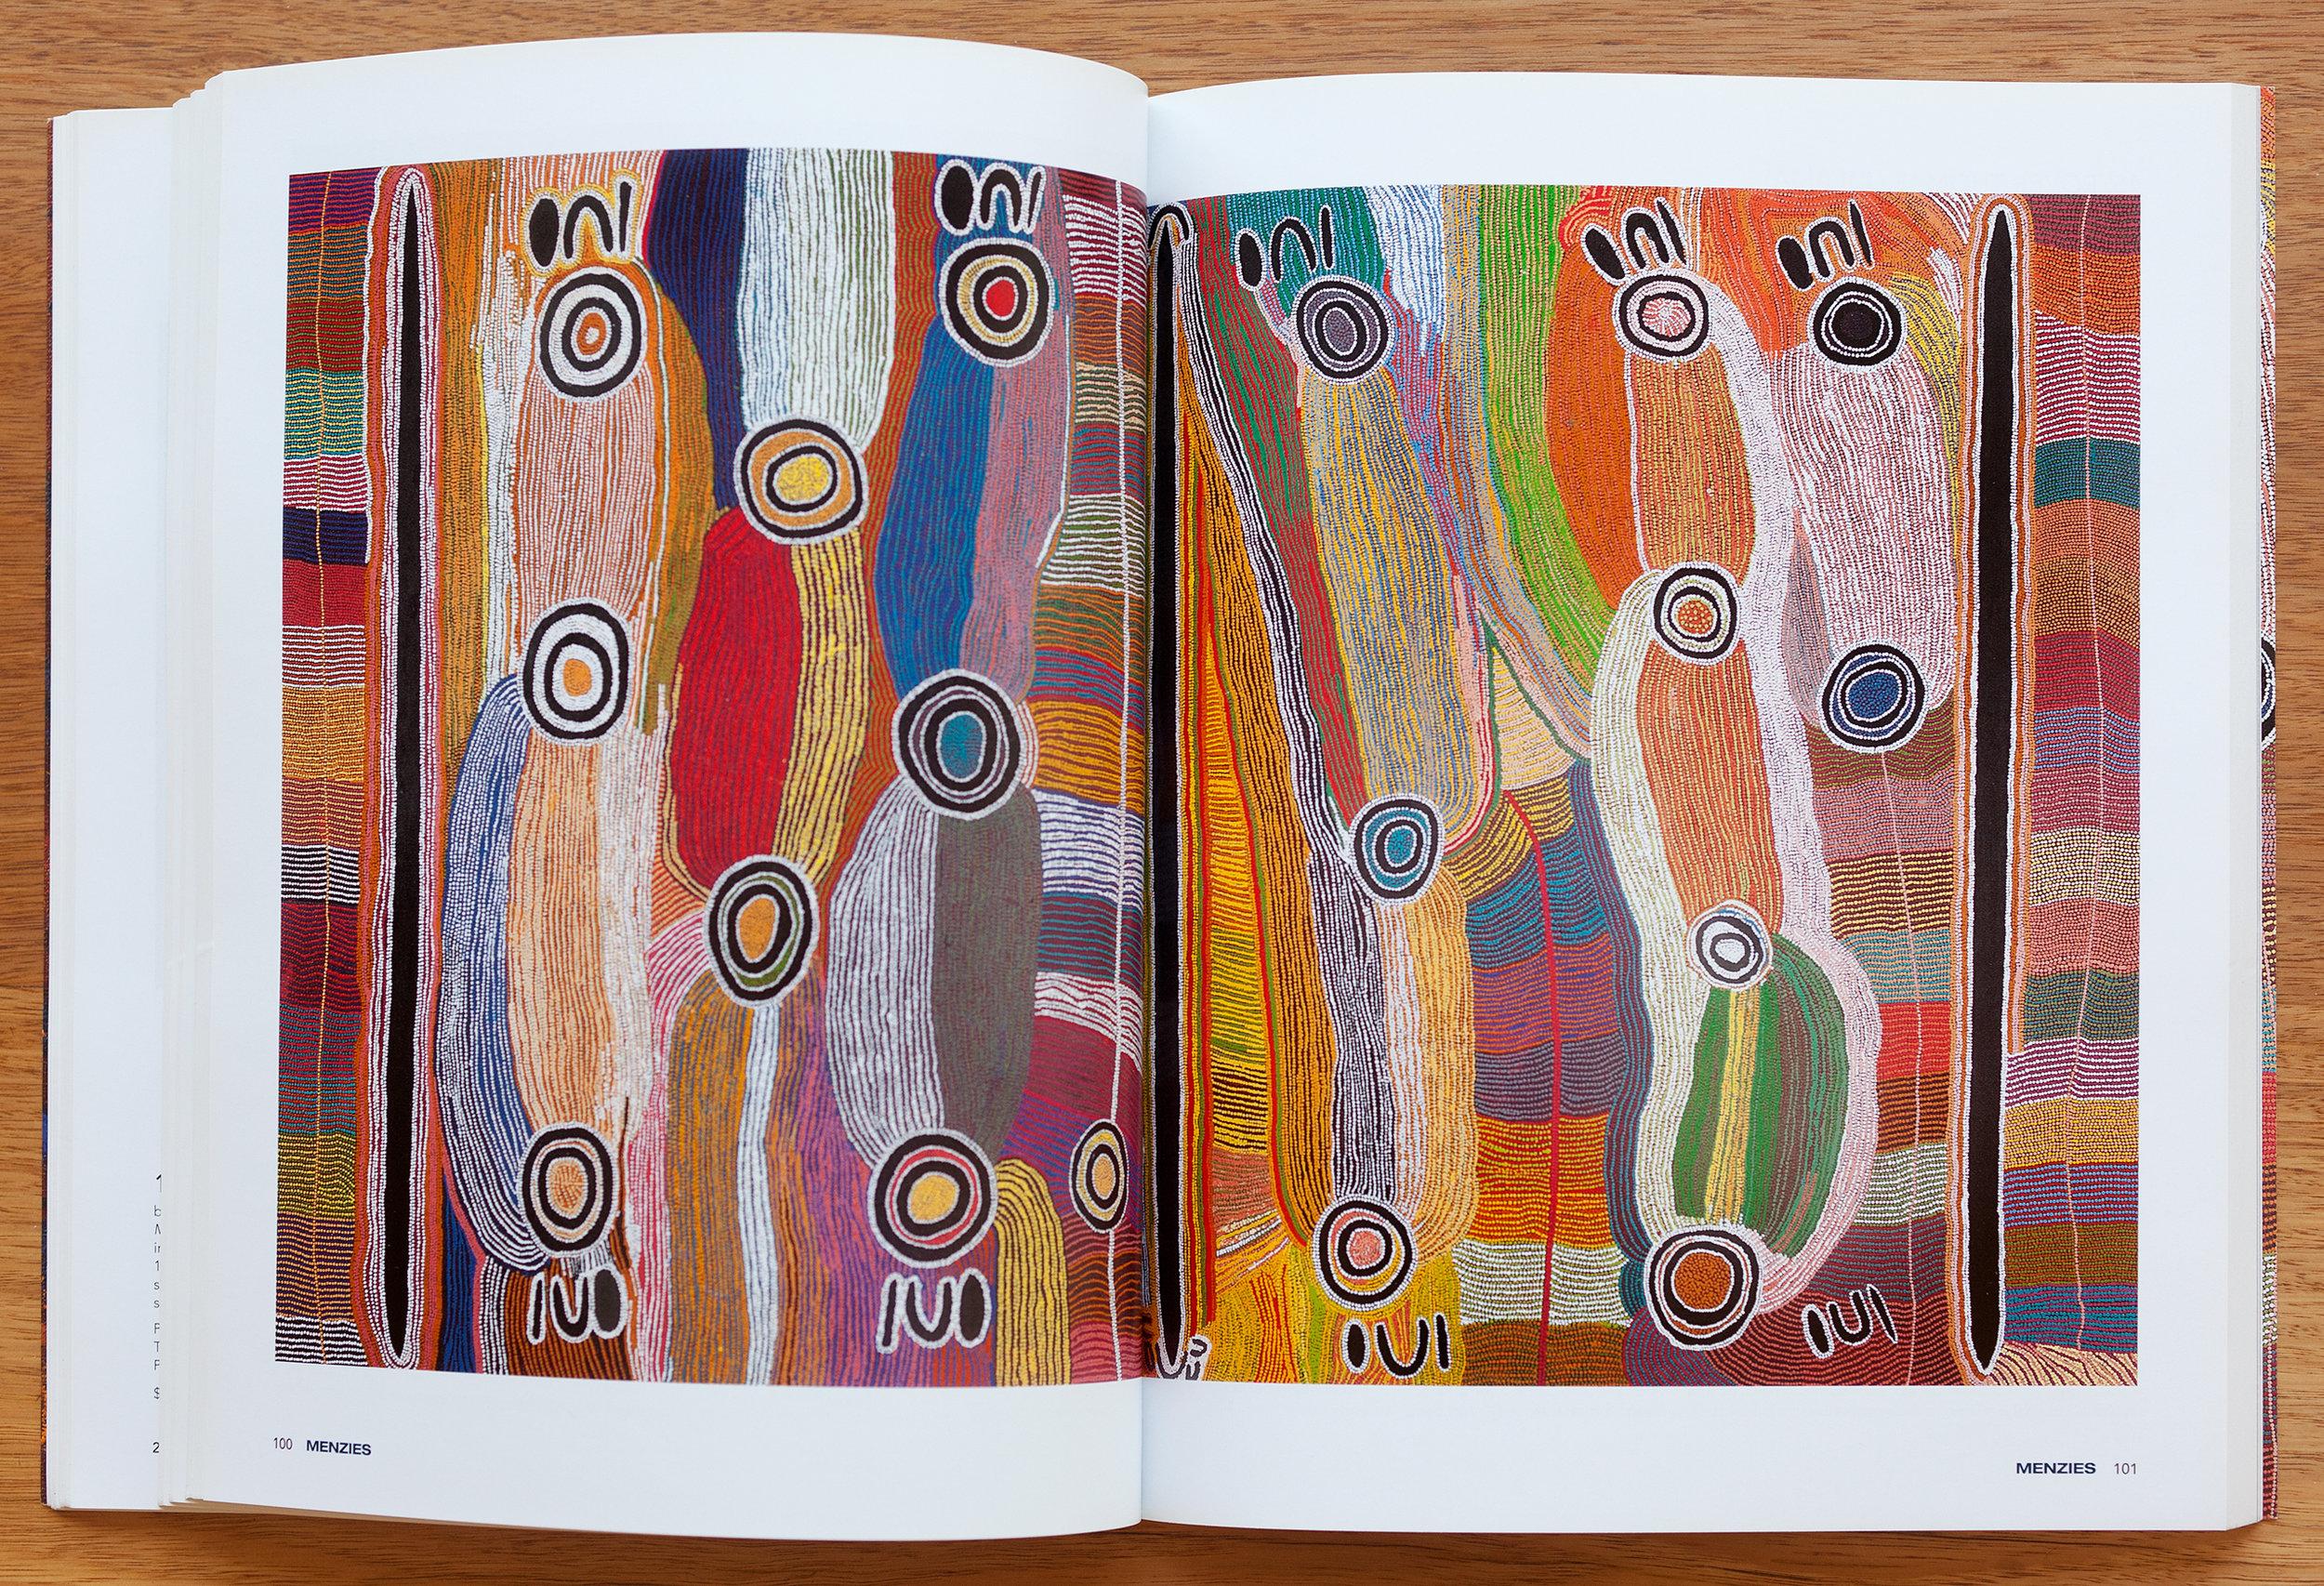 171023 Menzies Catalogues_003.jpg